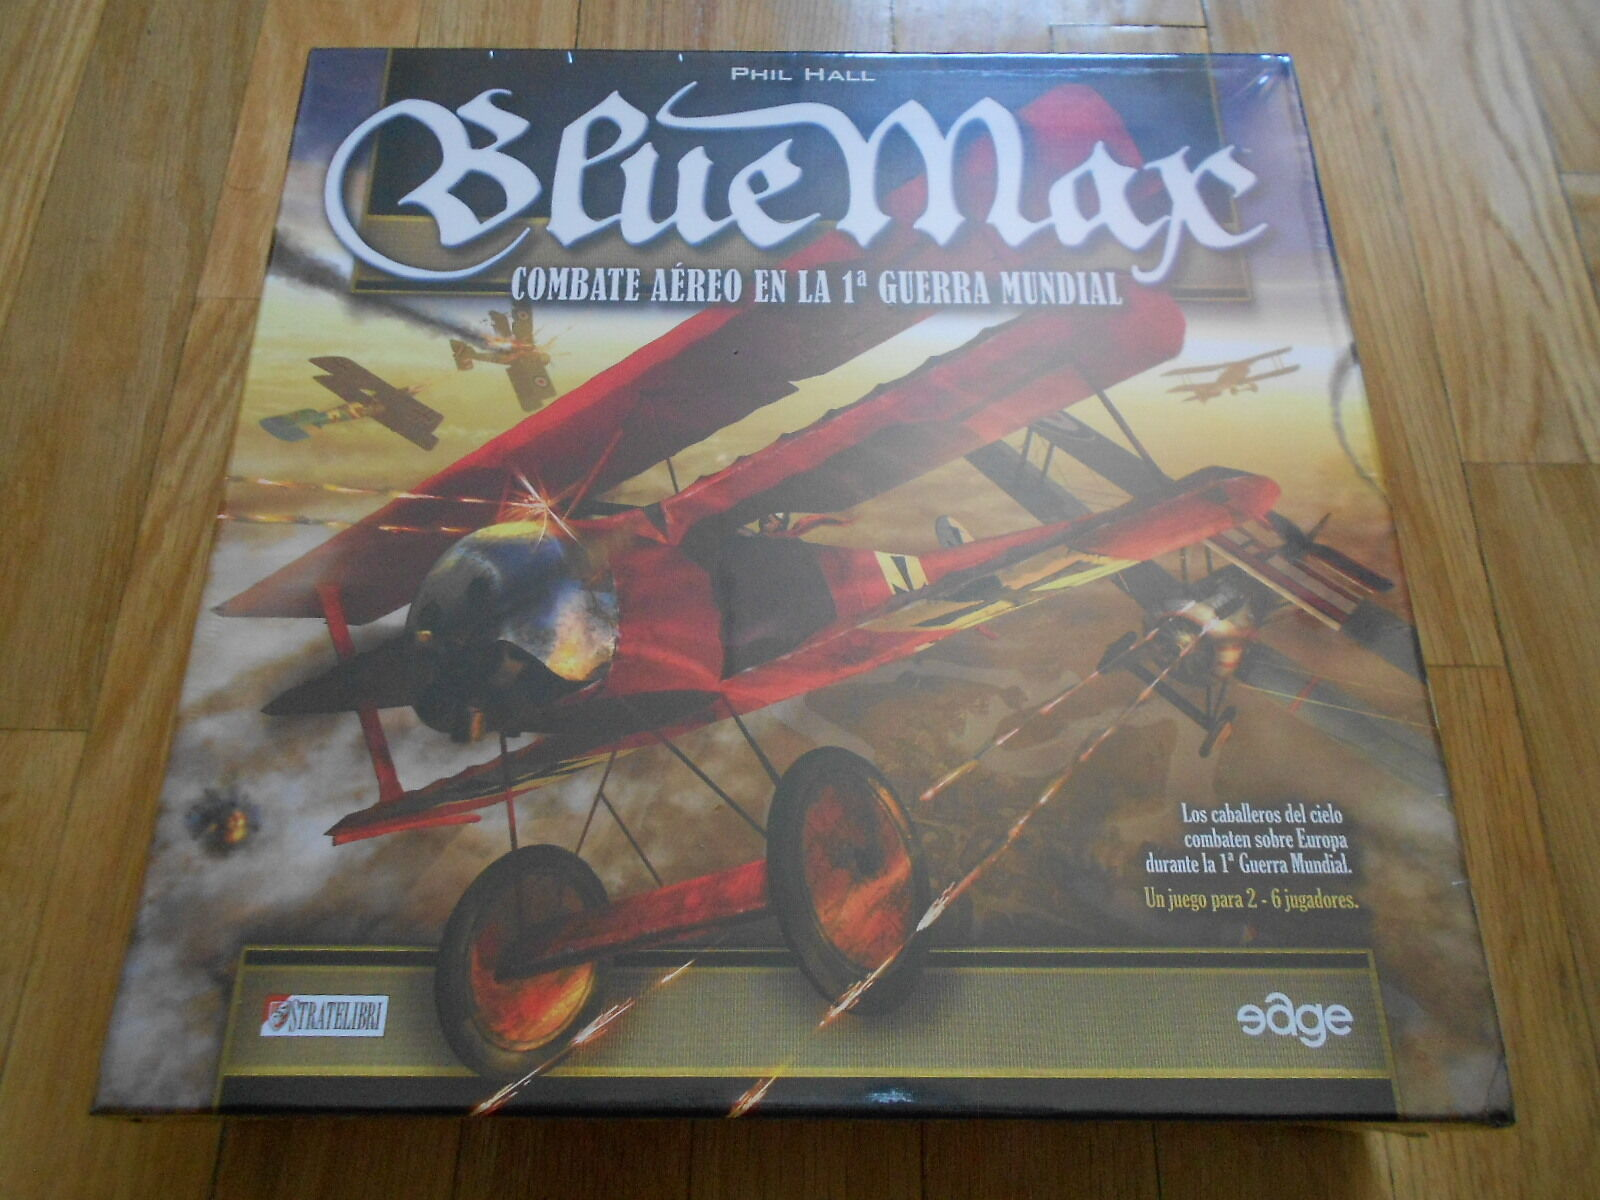 Juego wargame blueeE MAX - EDGE - Caballeros del Aire - WWI - estrategia - OFERTA